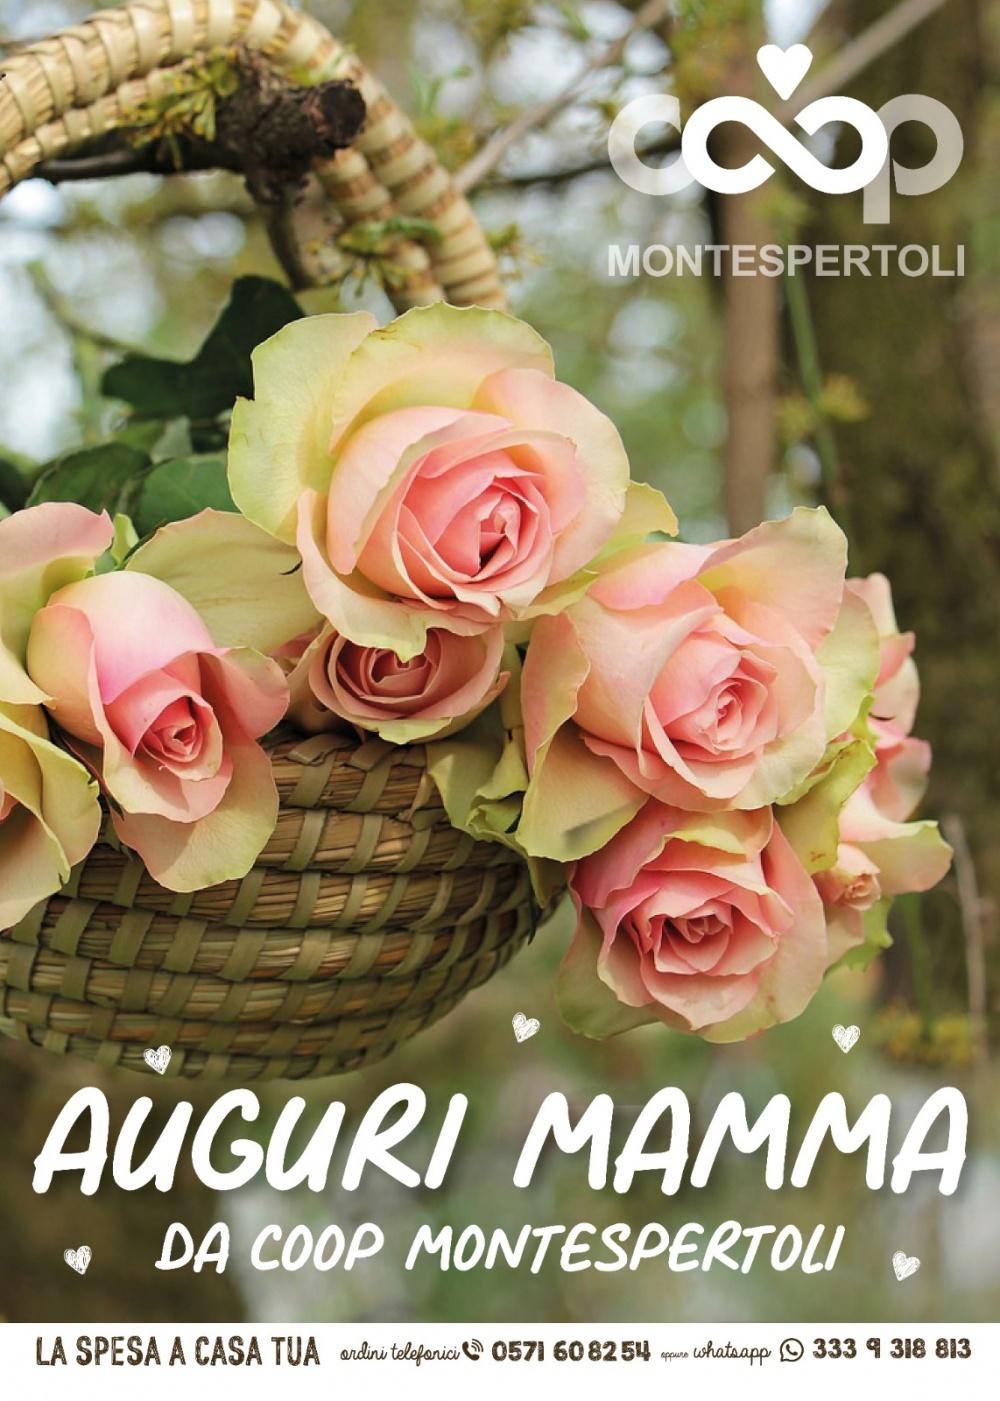 Auguri alle mamme